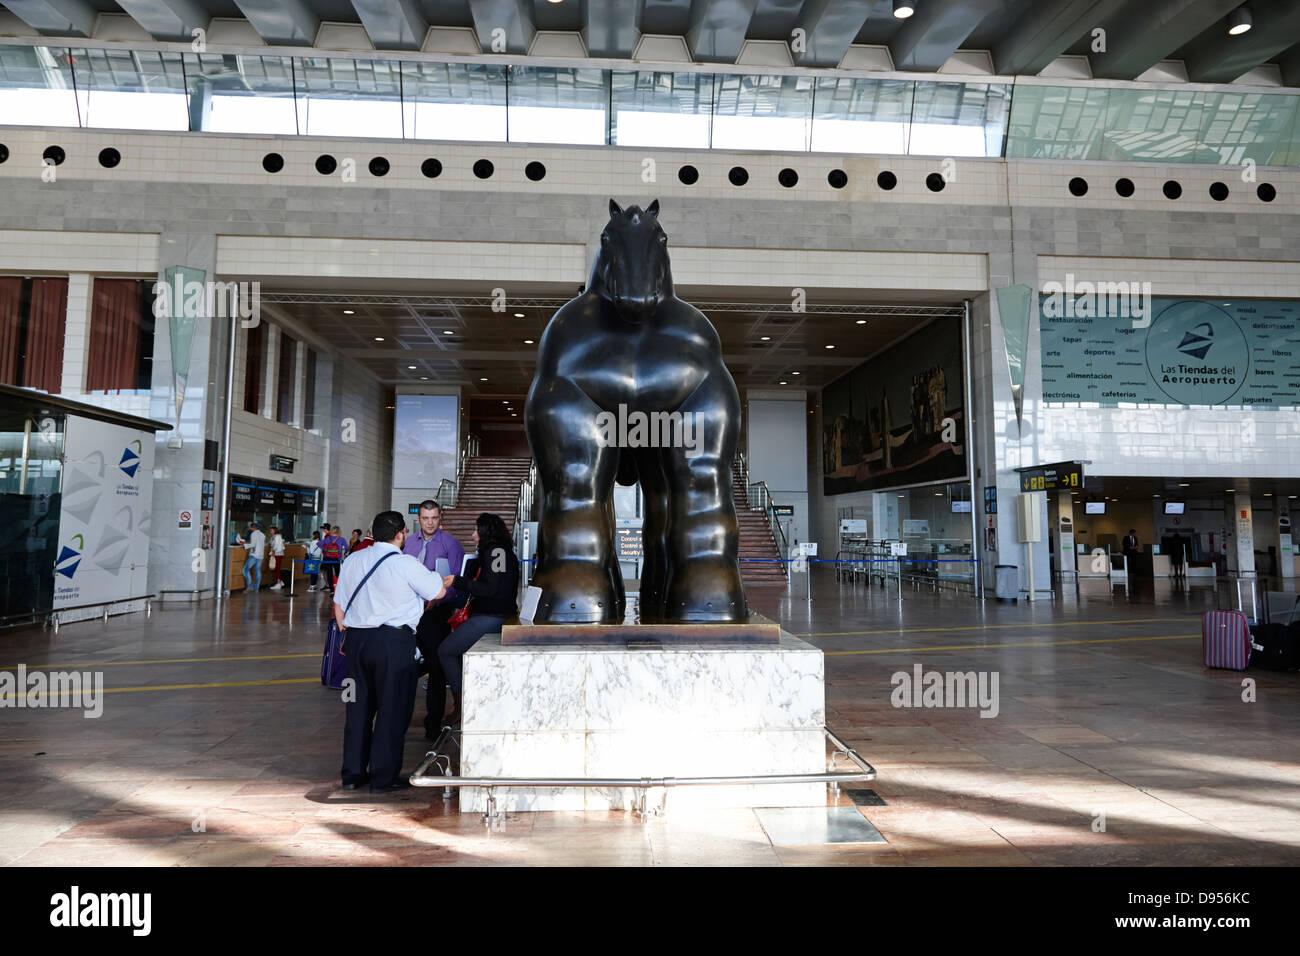 black horse sculpture by botero in barcelona el prat airport terminal 2 catalonia spain - Stock Image